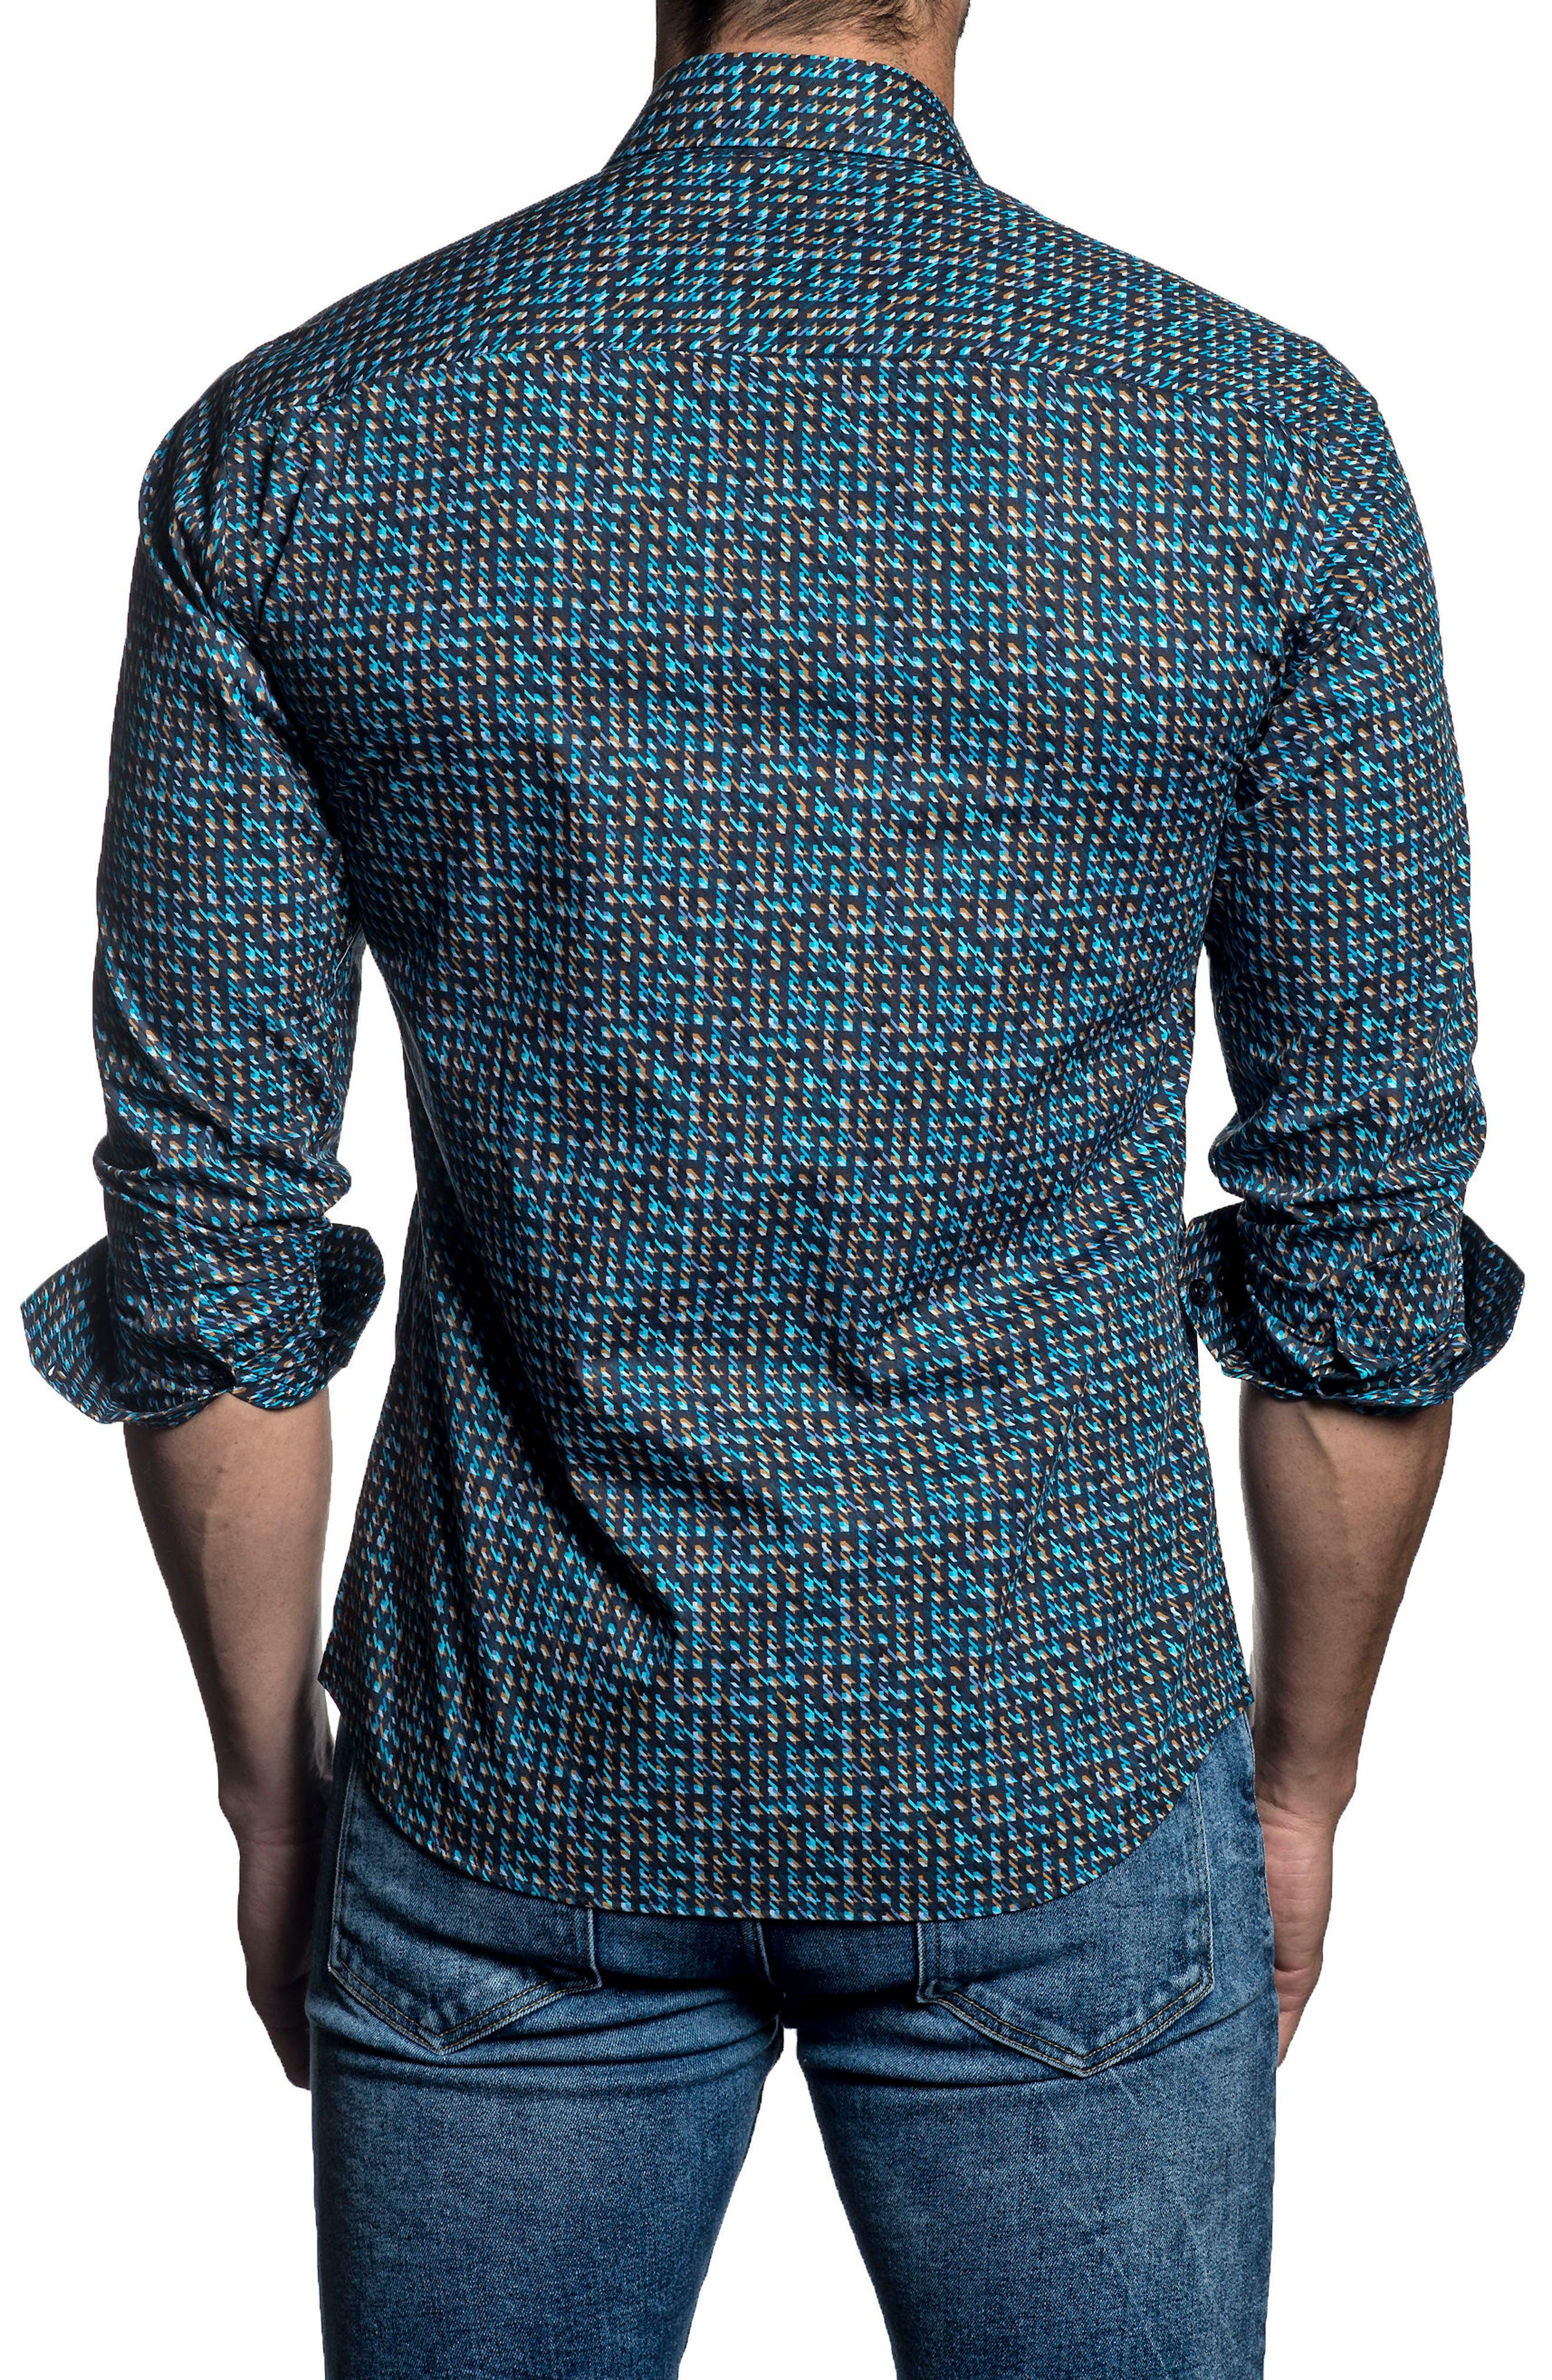 Trim Fit Sport Shirt,                             Alternate thumbnail 2, color,                             Navy/ Turquoise Print